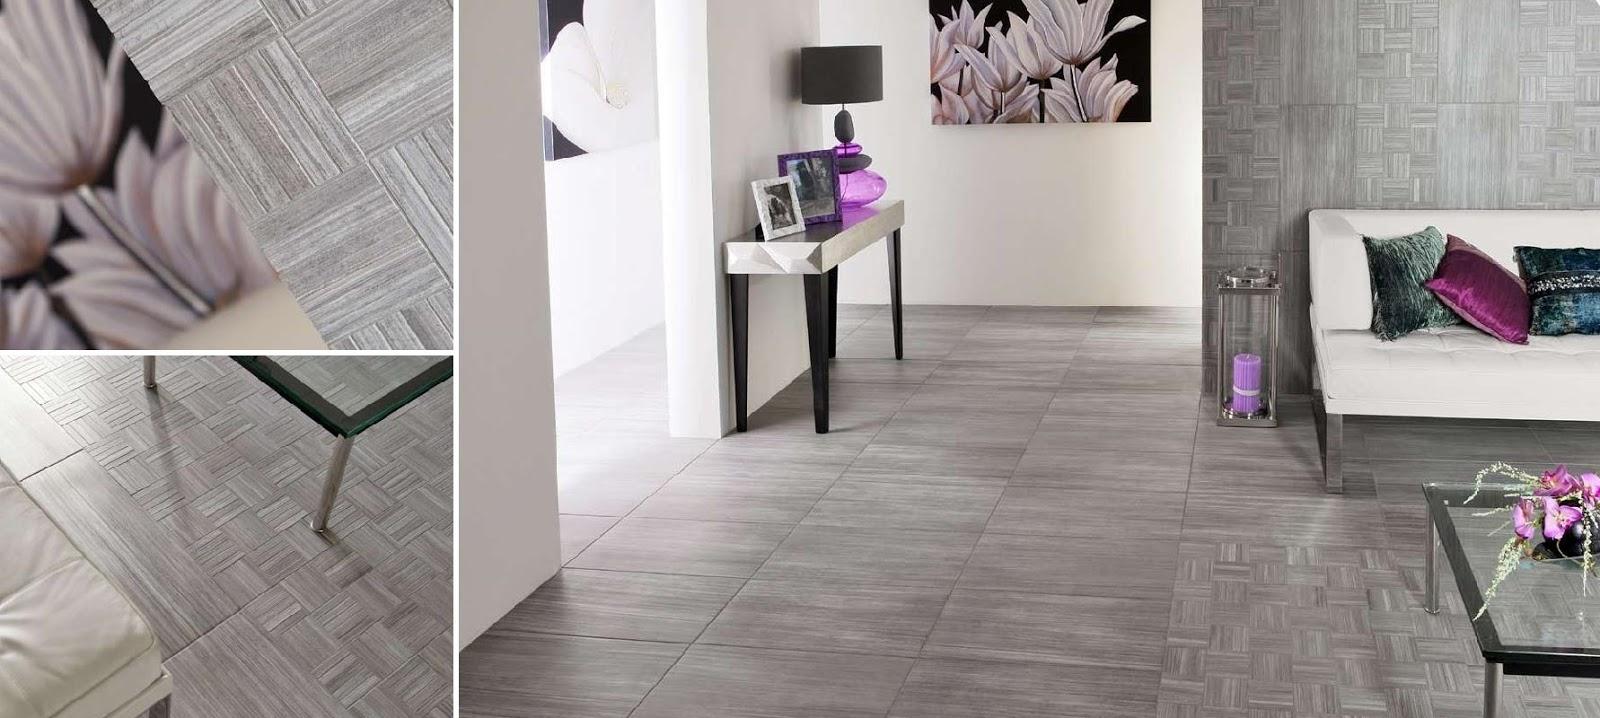 Cedir Porcelain Tile New Jersey Gto Outlets Grey